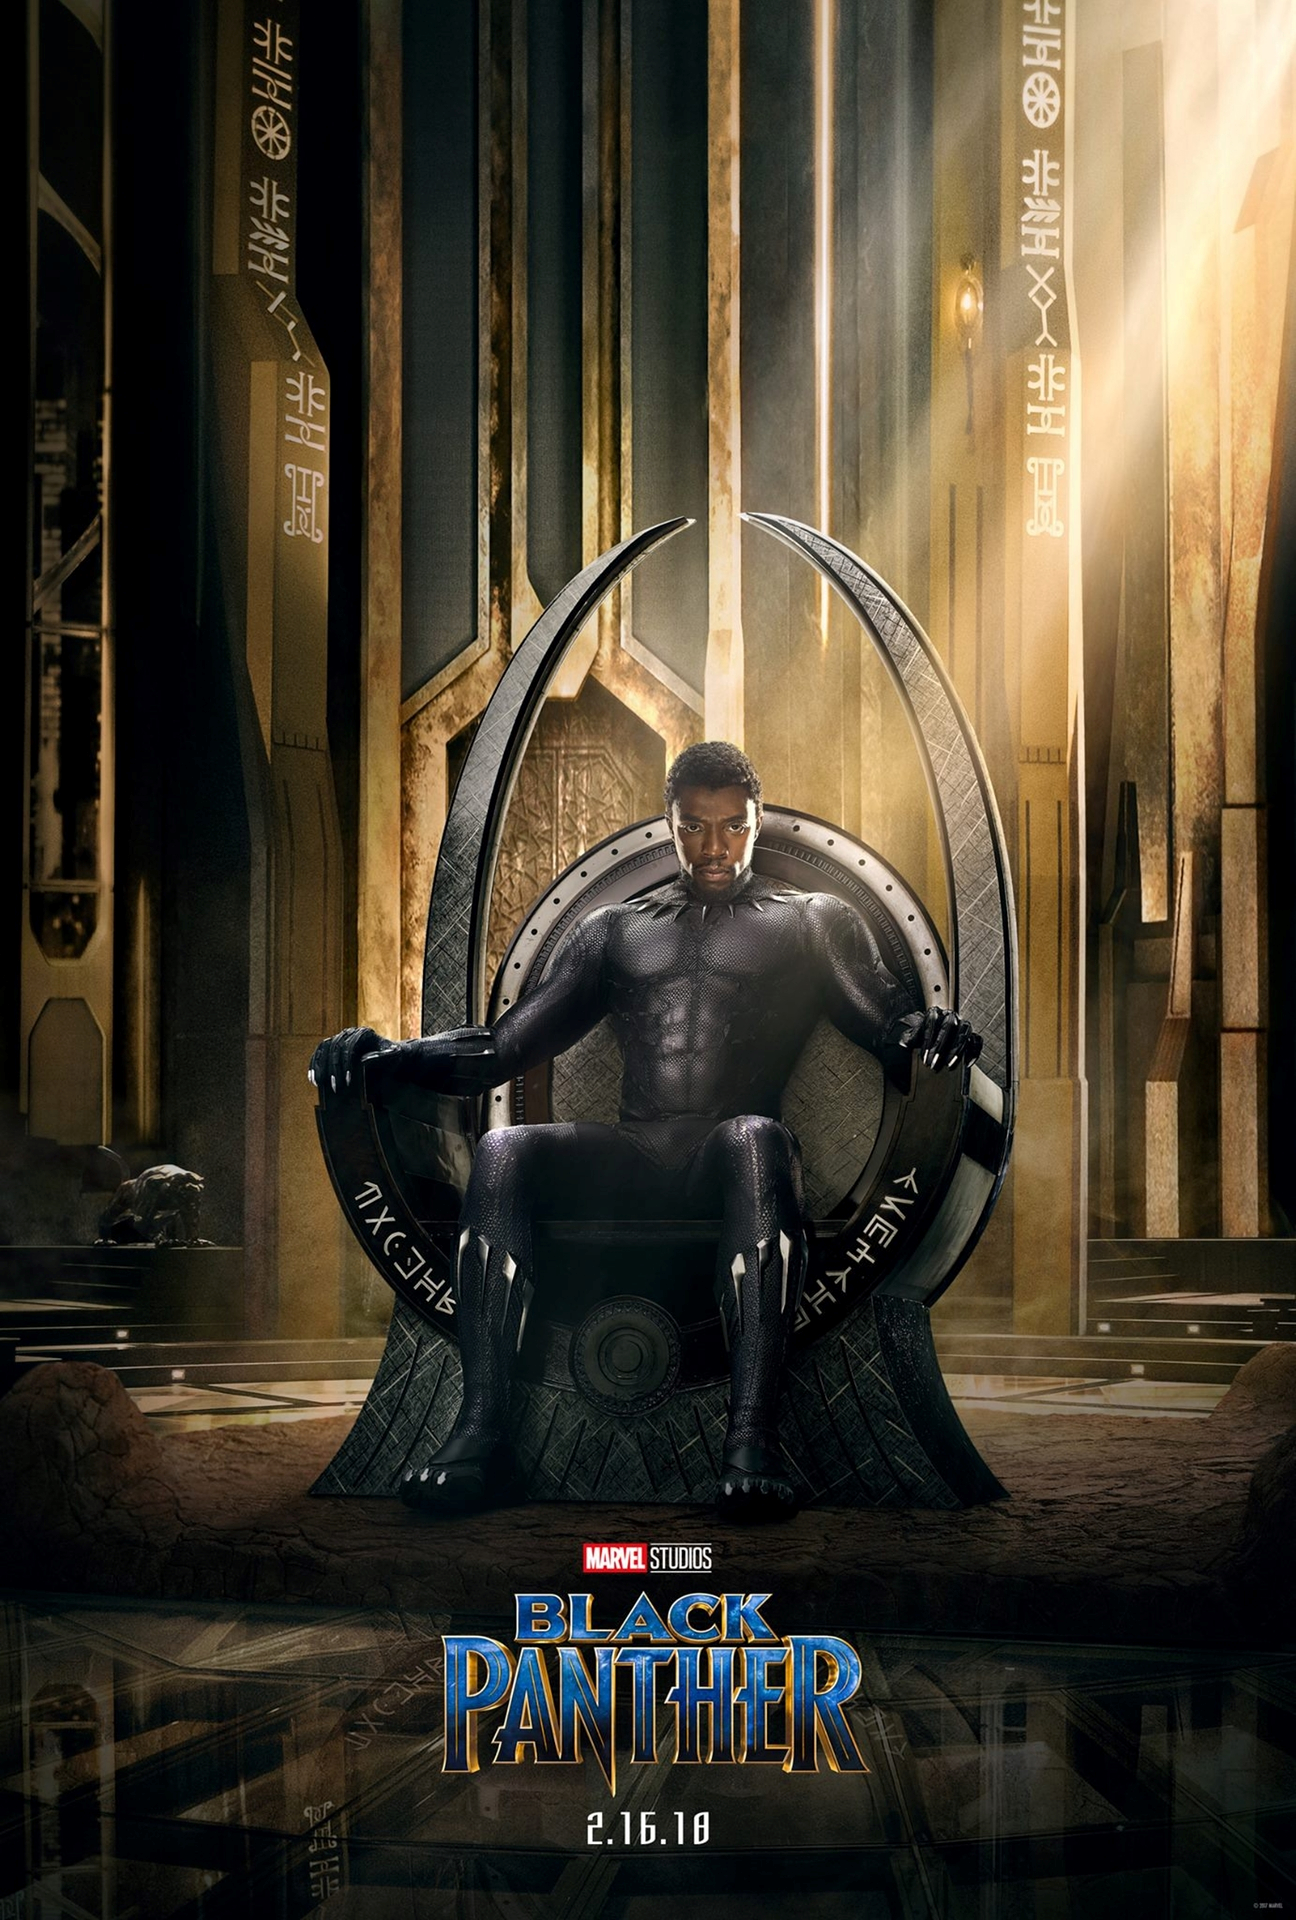 La locandina del film di Pantera Nera: Marvel Black Panther